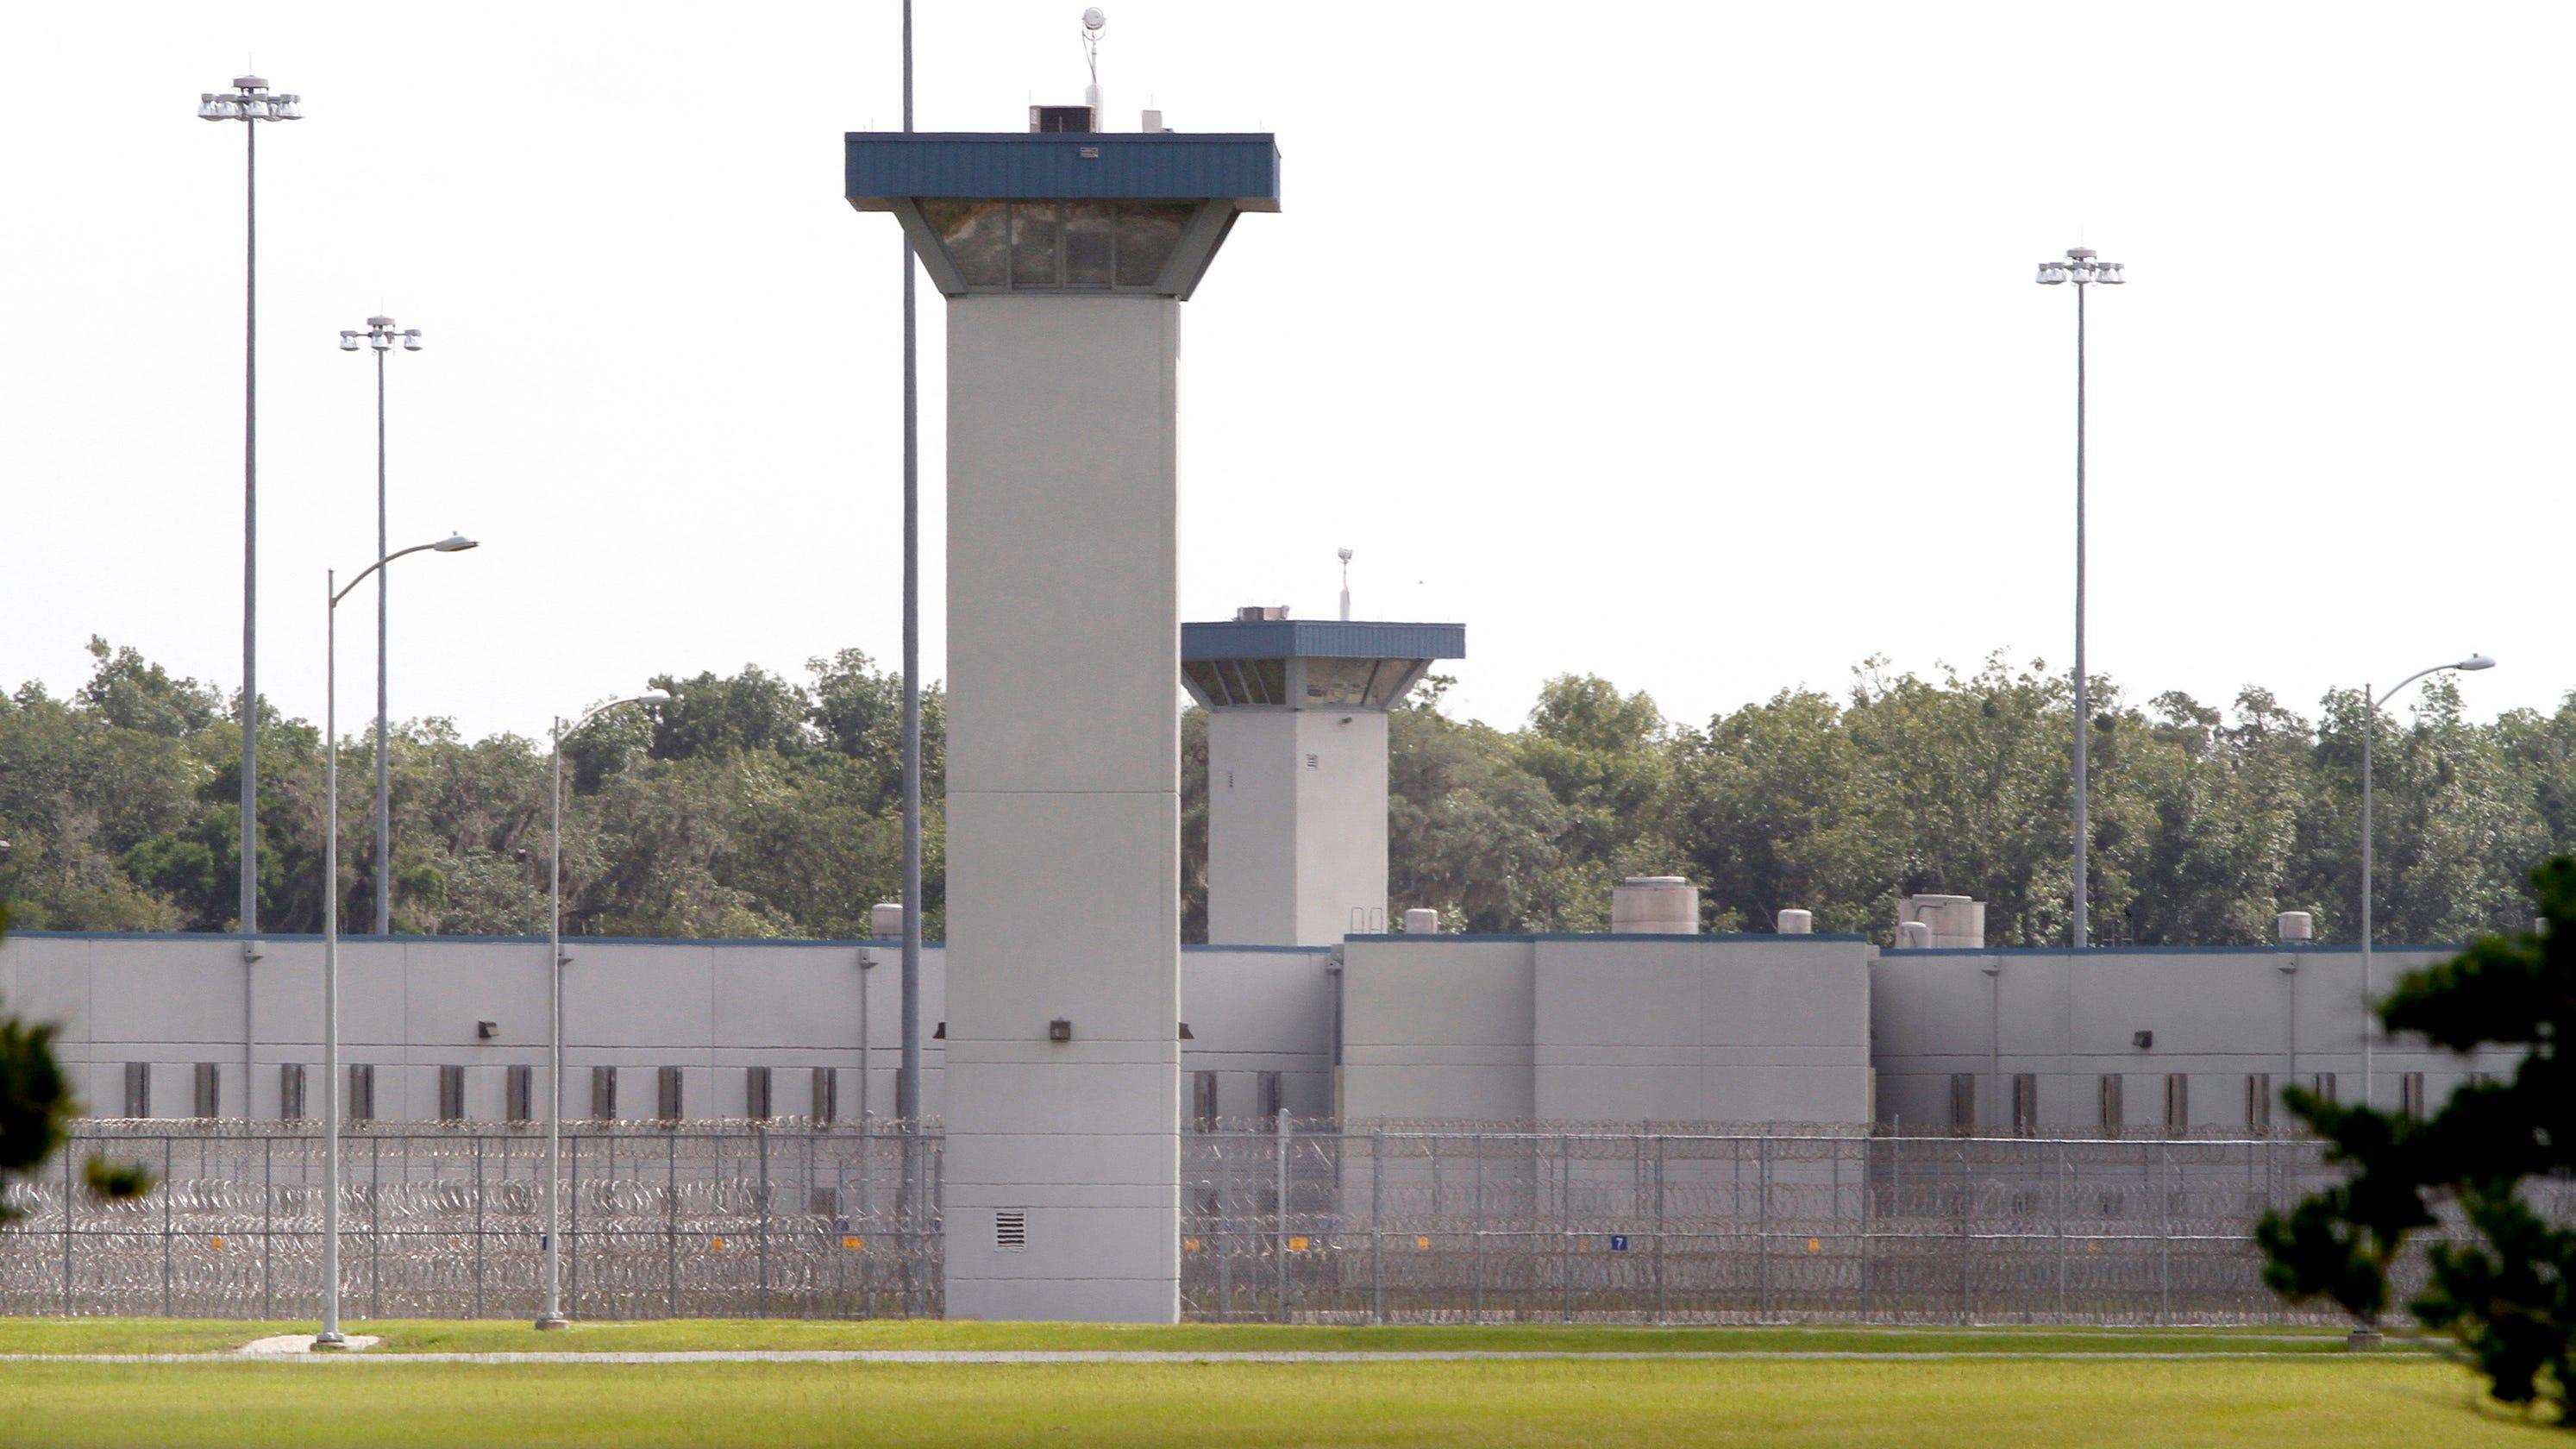 Federal inmates get Cornish hens, steak during gov't shutdown